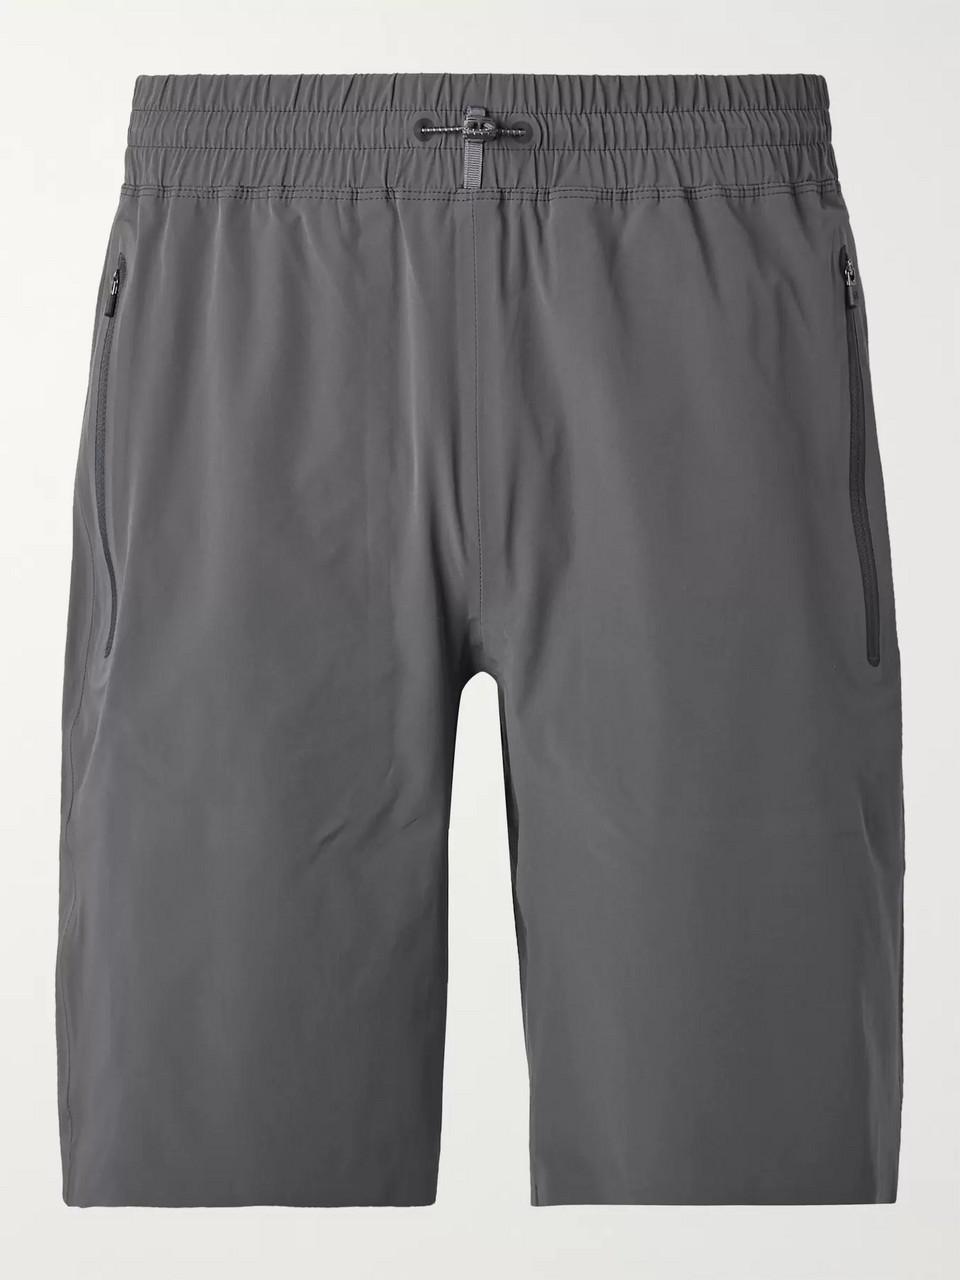 46eac2479ae53 Men's Shorts | Designer Menswear | MR PORTER